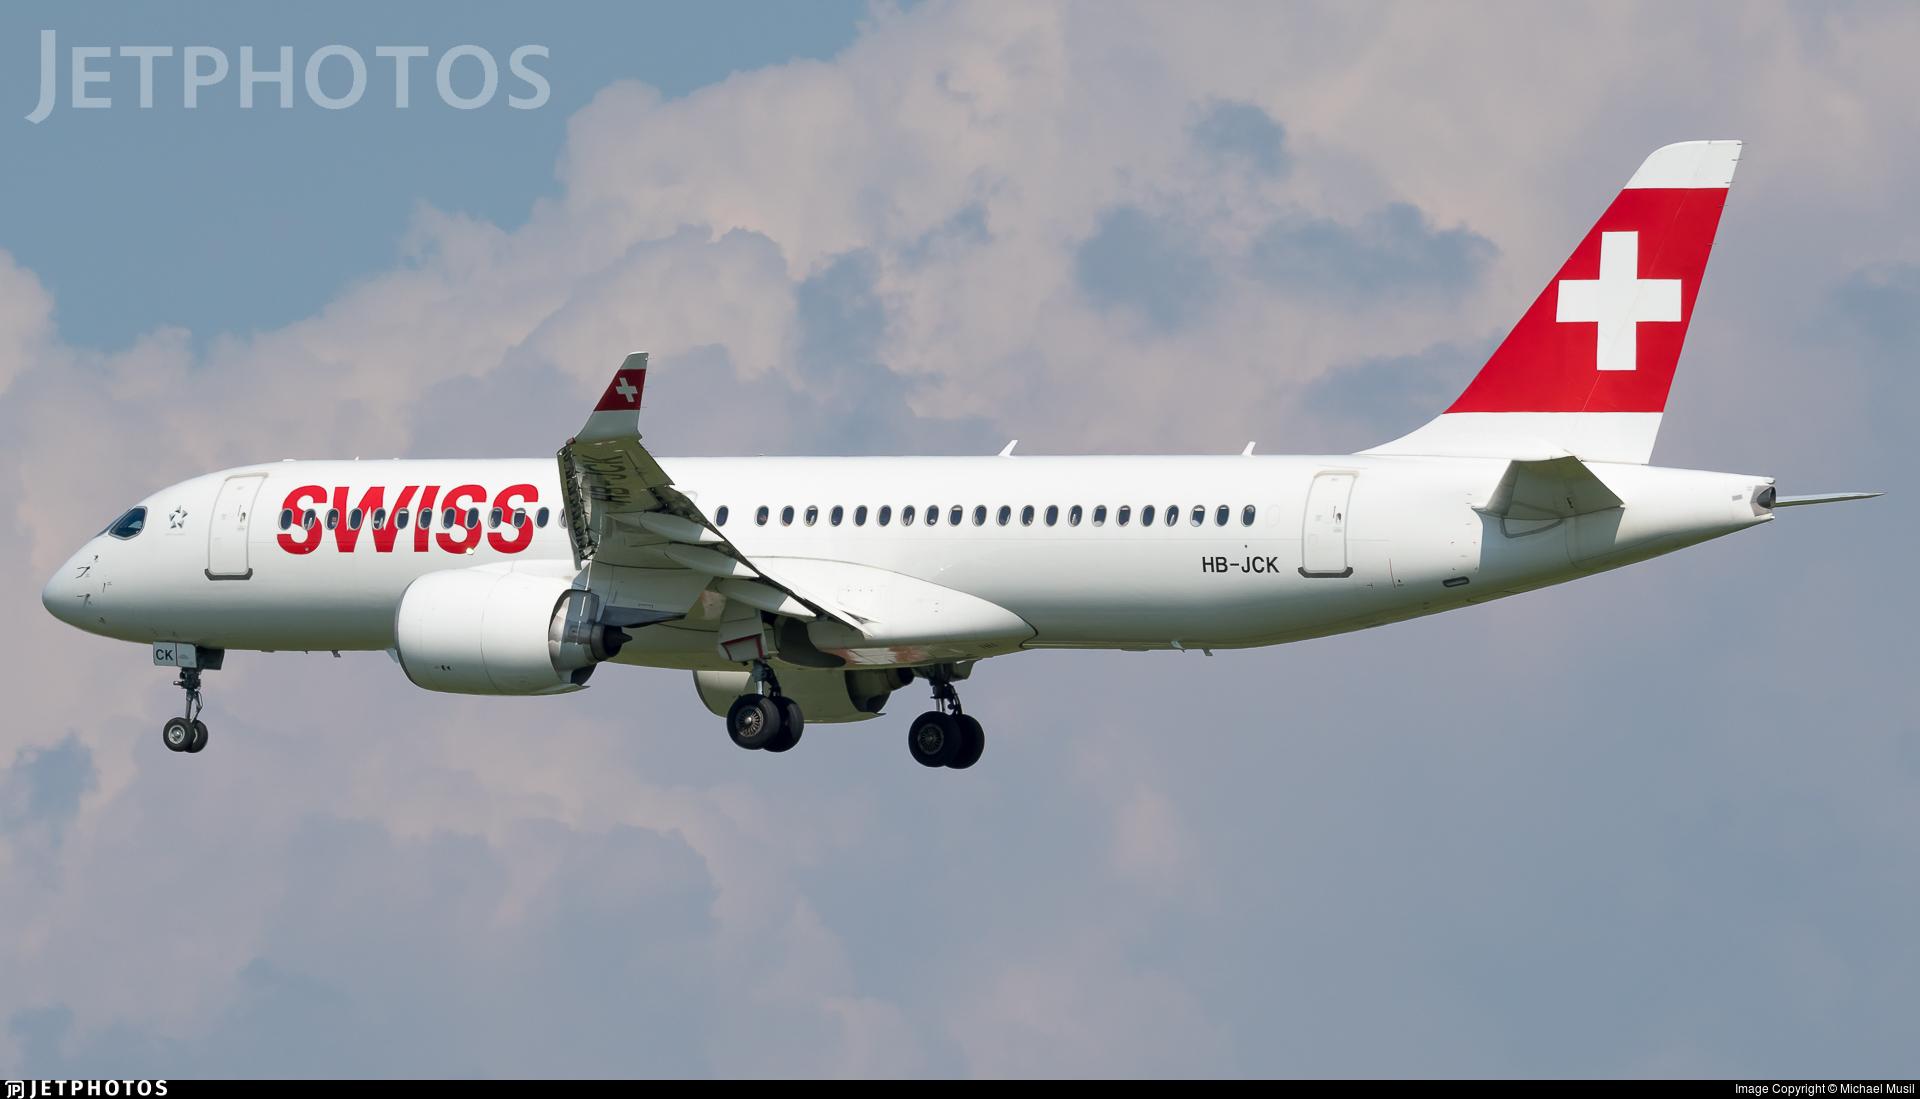 HB-JCK - Bombardier CSeries CS300 - Swiss